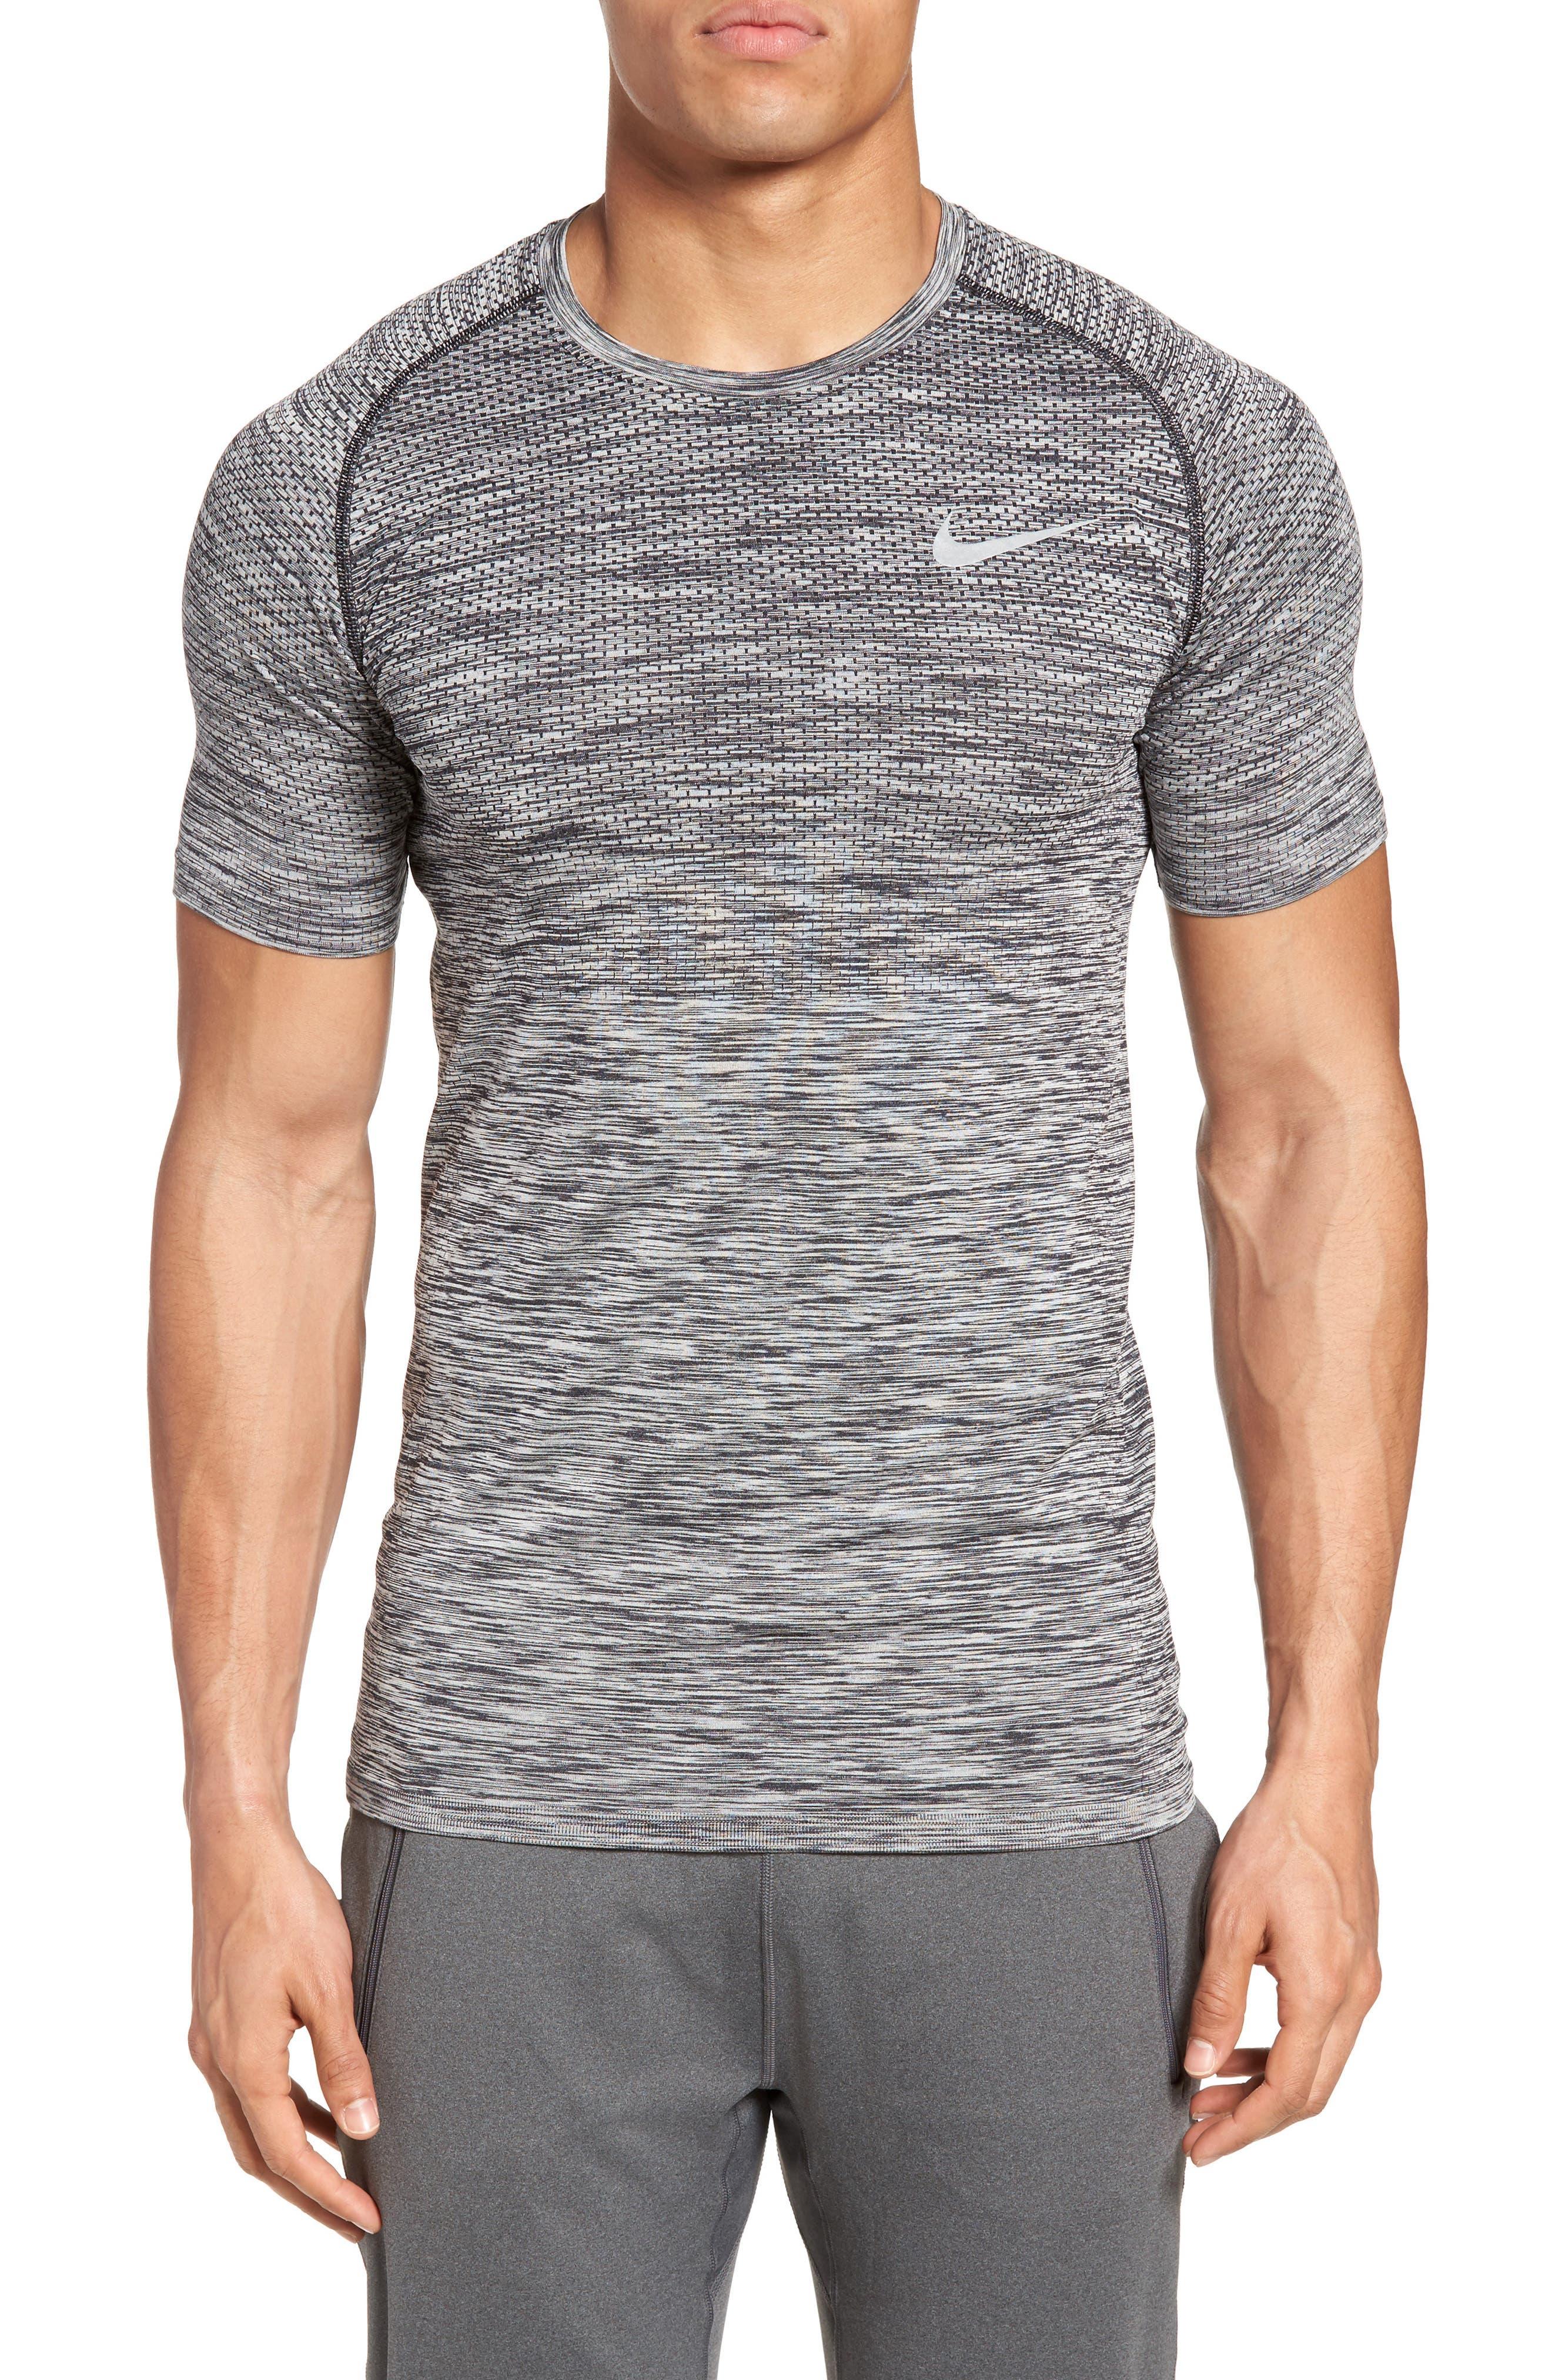 Men Dry Knit Running T-Shirt,                             Main thumbnail 1, color,                             Black/ Heather